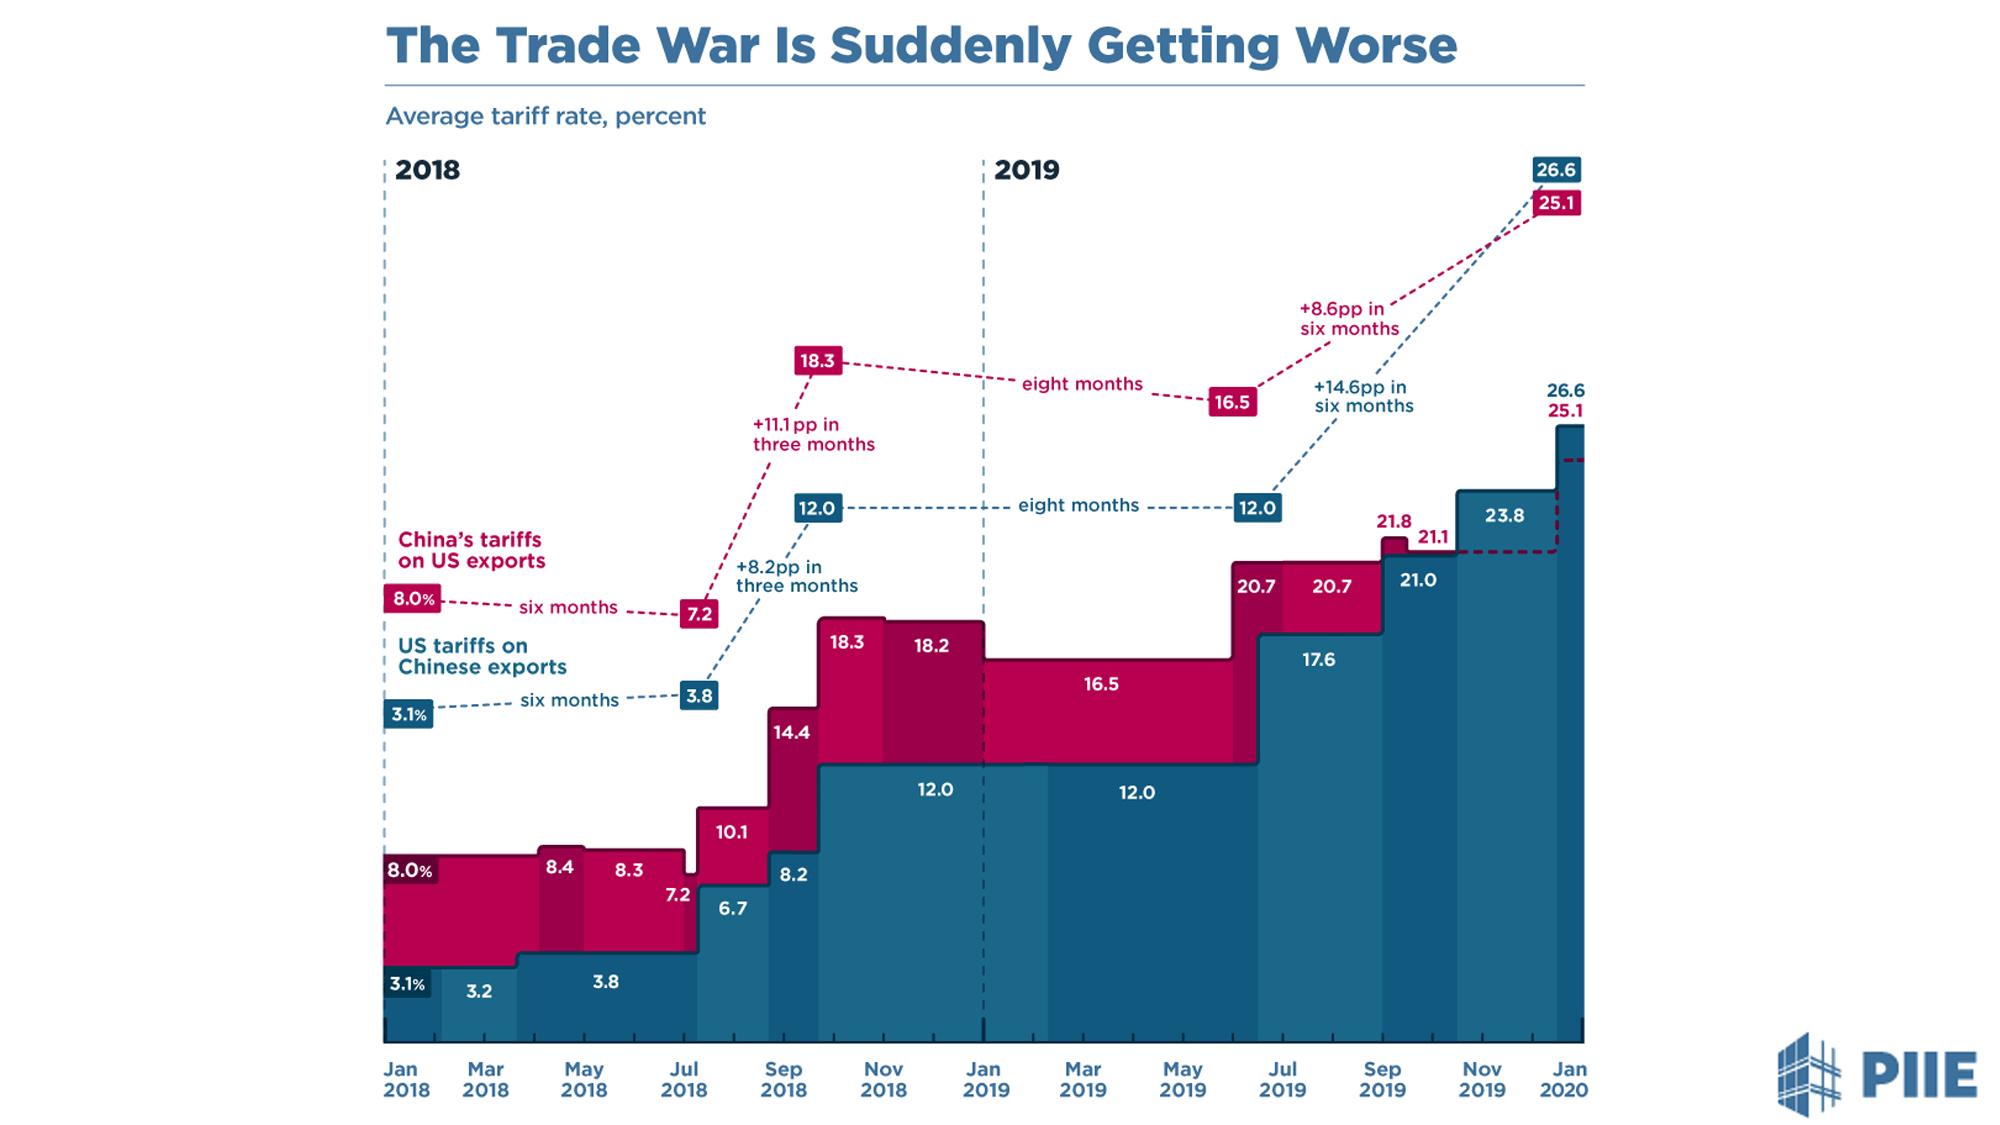 "Trump presiona a la Fed para que reduzca más las tasas a medida que los Megabancos agotan el balance general ""width ="" 2000 ""height ="" 1125 ""srcset = ""http://blackswanfinances.com/wp-content/uploads/2019/10/twar.jpg 2000w, https://news.bitcoin.com/wp-content/uploads/2019/10/twar-300x169 .jpg 300w, https://news.bitcoin.com/wp-content/uploads/2019/10/twar-768x432.jpg 768w, https://news.bitcoin.com/wp-content/uploads/2019/10 /twar-1024x576.jpg 1024w, https://news.bitcoin.com/wp-content/uploads/2019/10/twar-696x392.jpg 696w, https://news.bitcoin.com/wp-content/uploads /2019/10/twar-1392x783.jpg 1392w, https://news.bitcoin.com/wp-content/uploads/2019/10/twar-1068x601.jpg 1068w, https://news.bitcoin.com/wp -content / uploads / 2019/10 / twar-747x420.jpg 747w ""tamaños ="" (ancho máximo: 2000px) 100vw, 2000px"